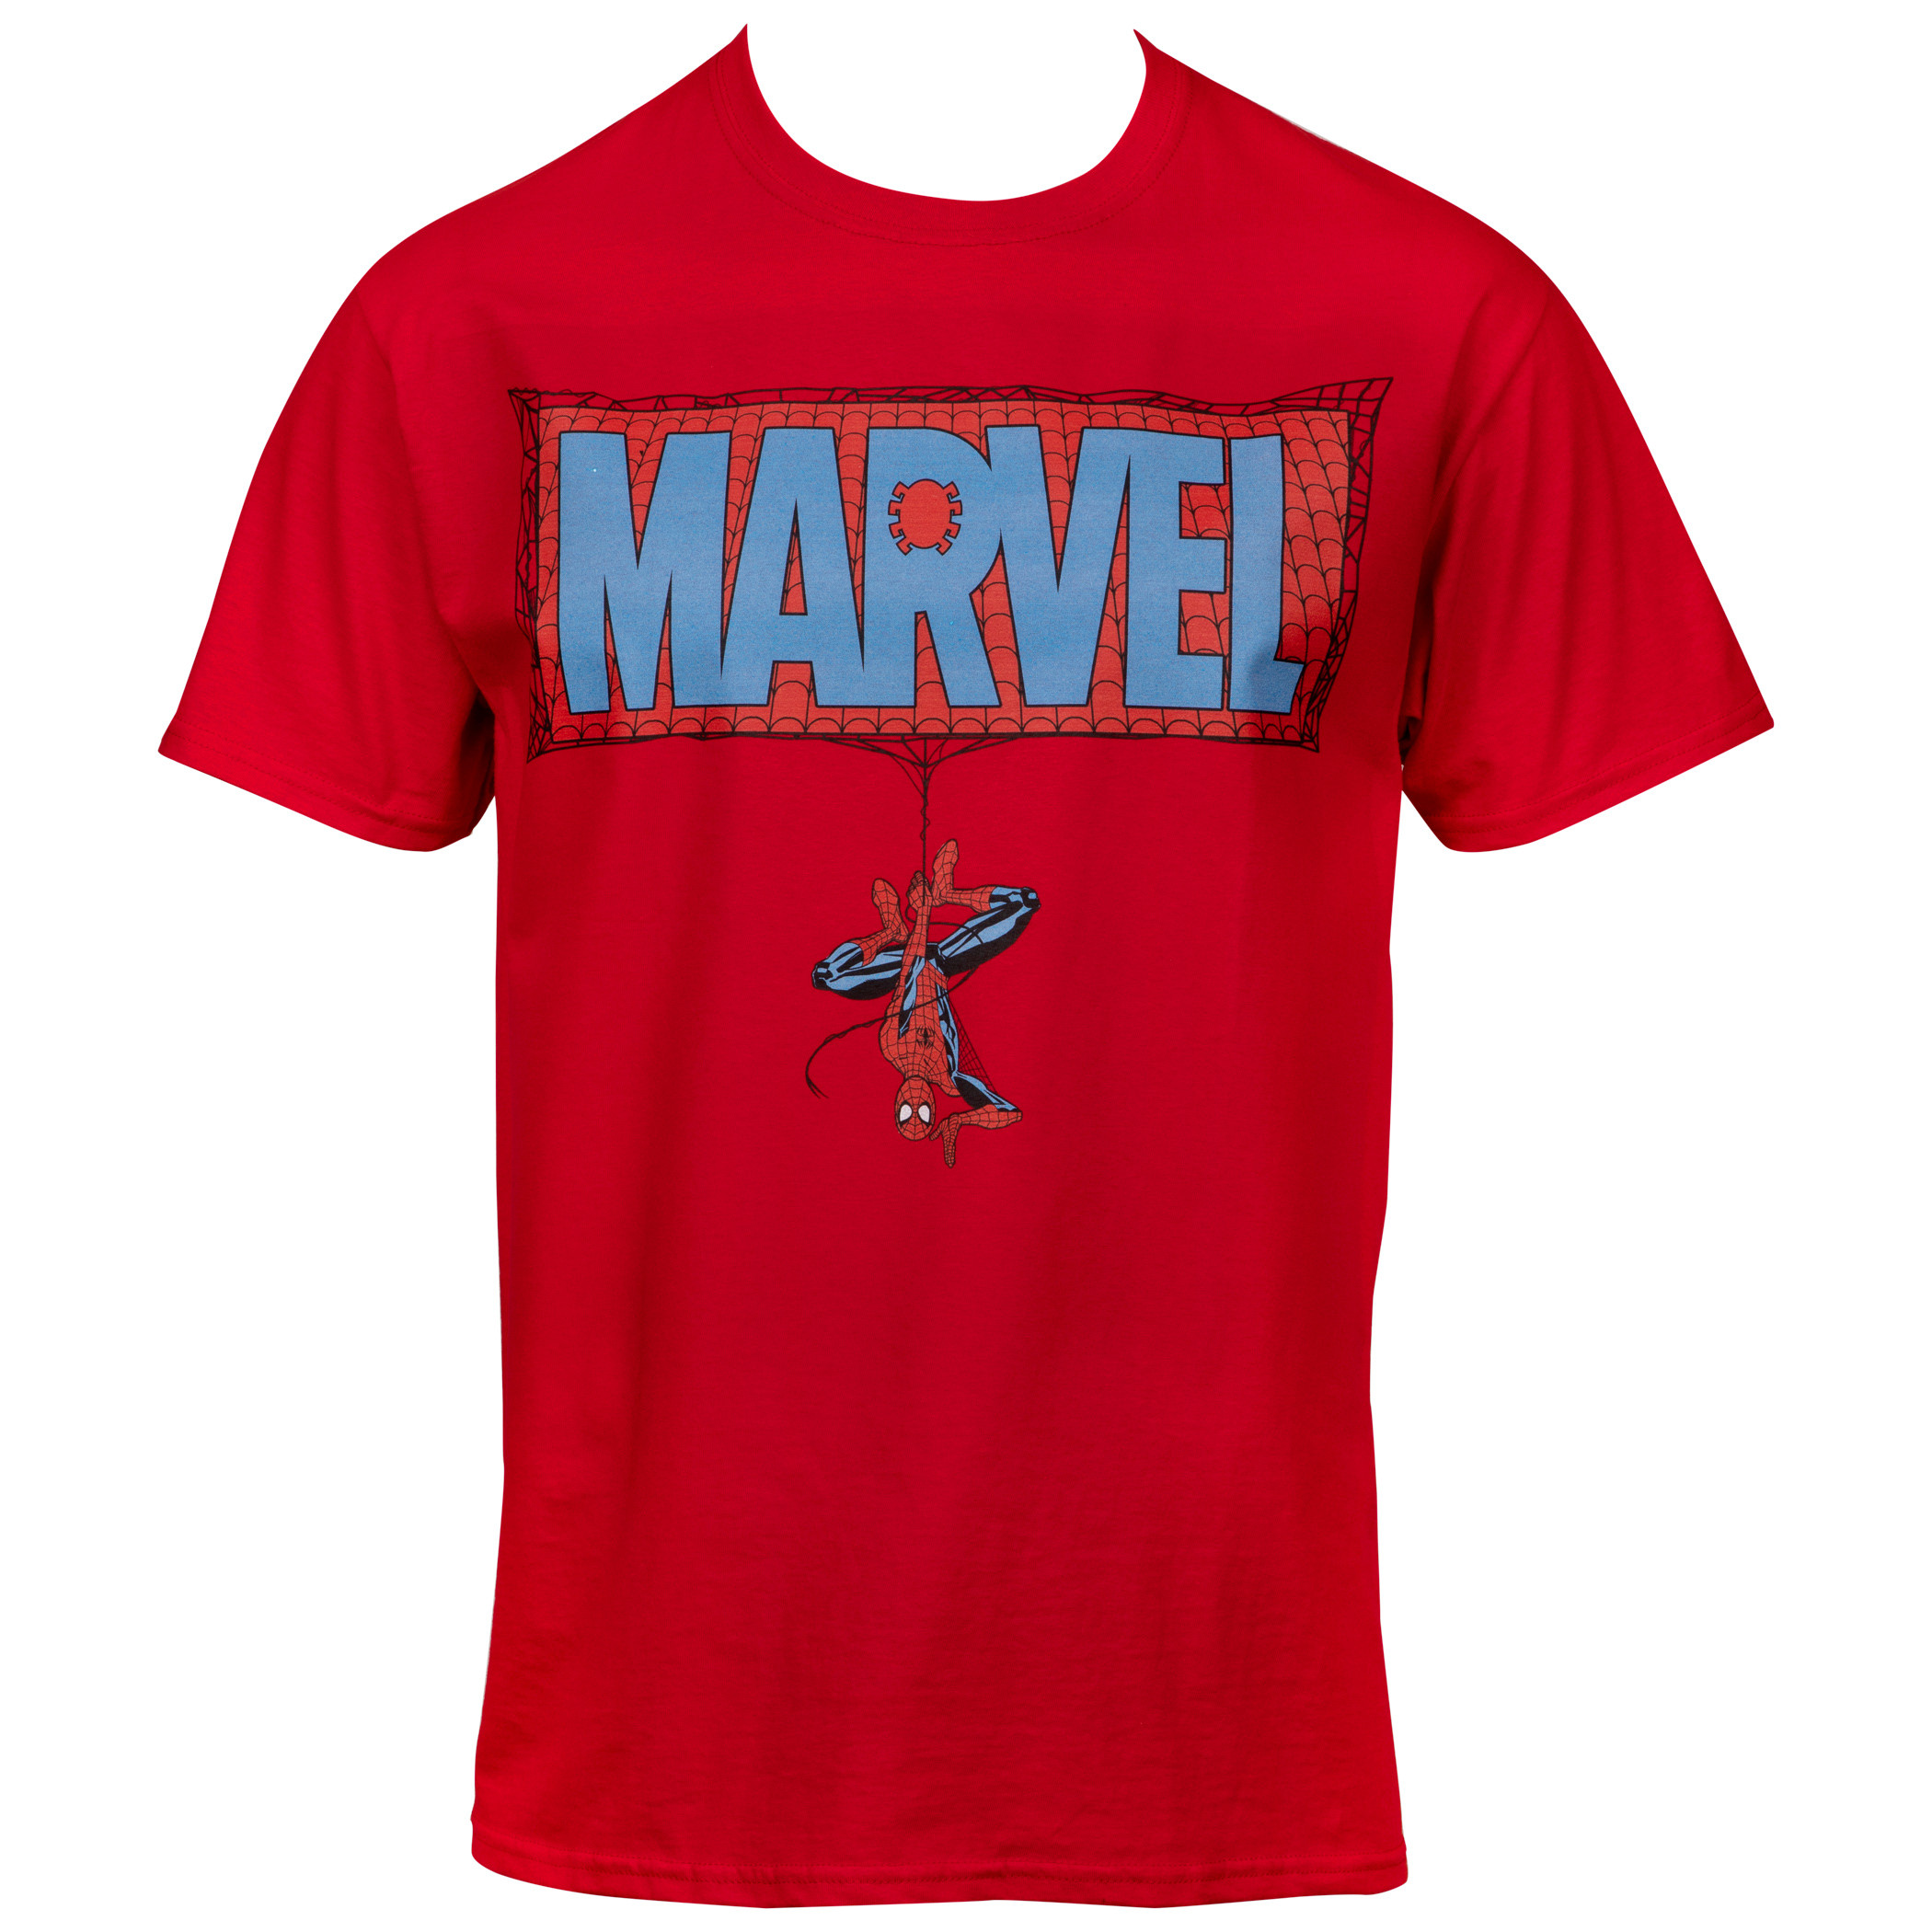 Marvel Comics Text Brand Spider-man Themed T-shirt